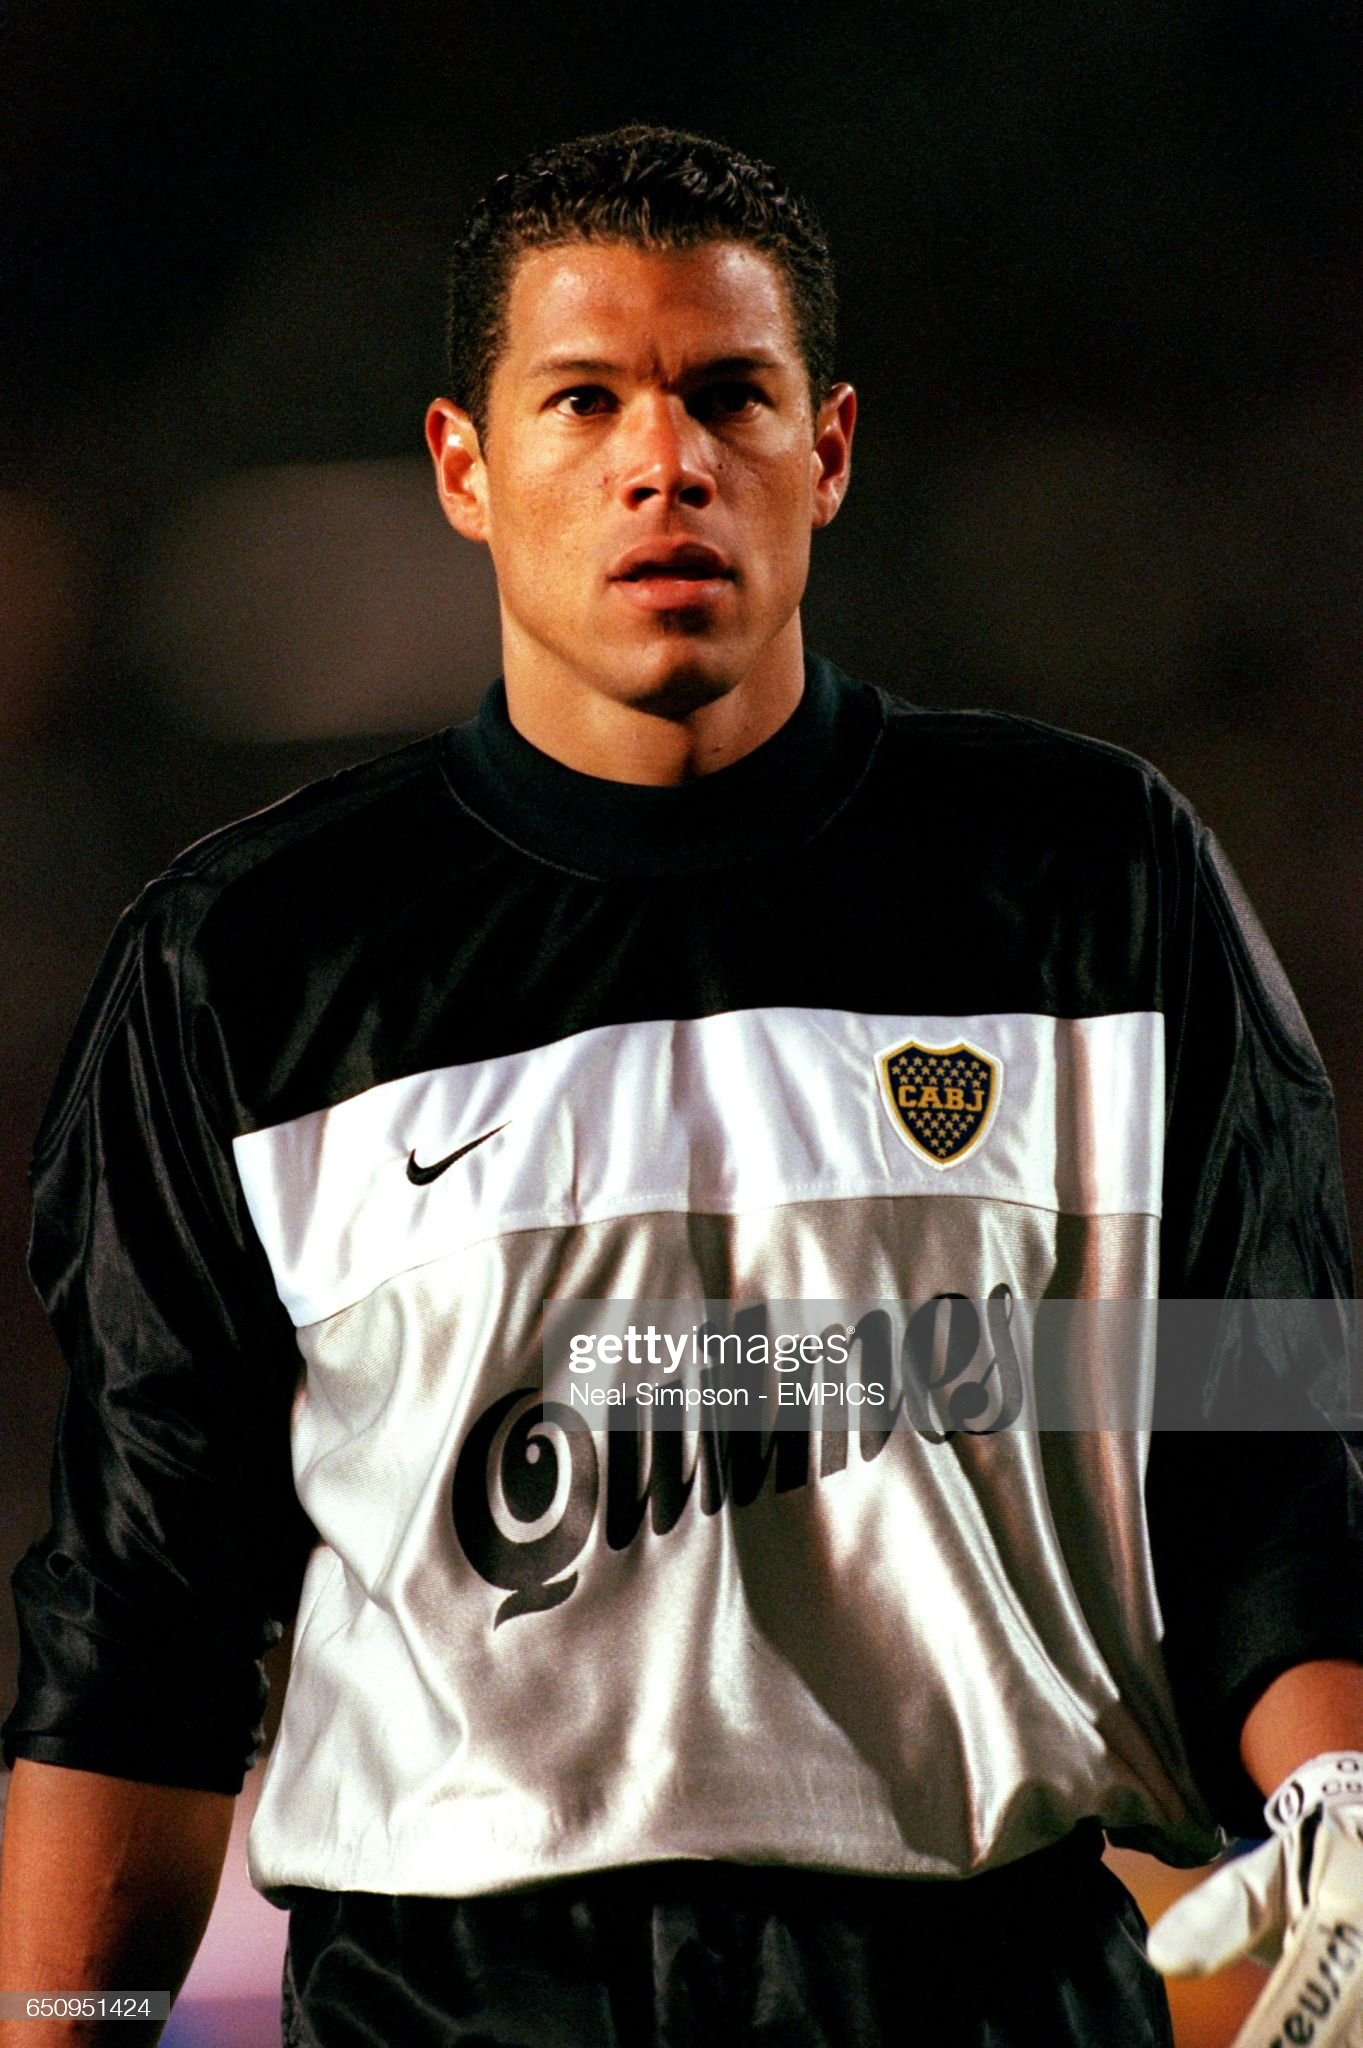 [Imagen: oscar-cordoba-boca-juniors-goalkeeper-pi...=2048x2048]